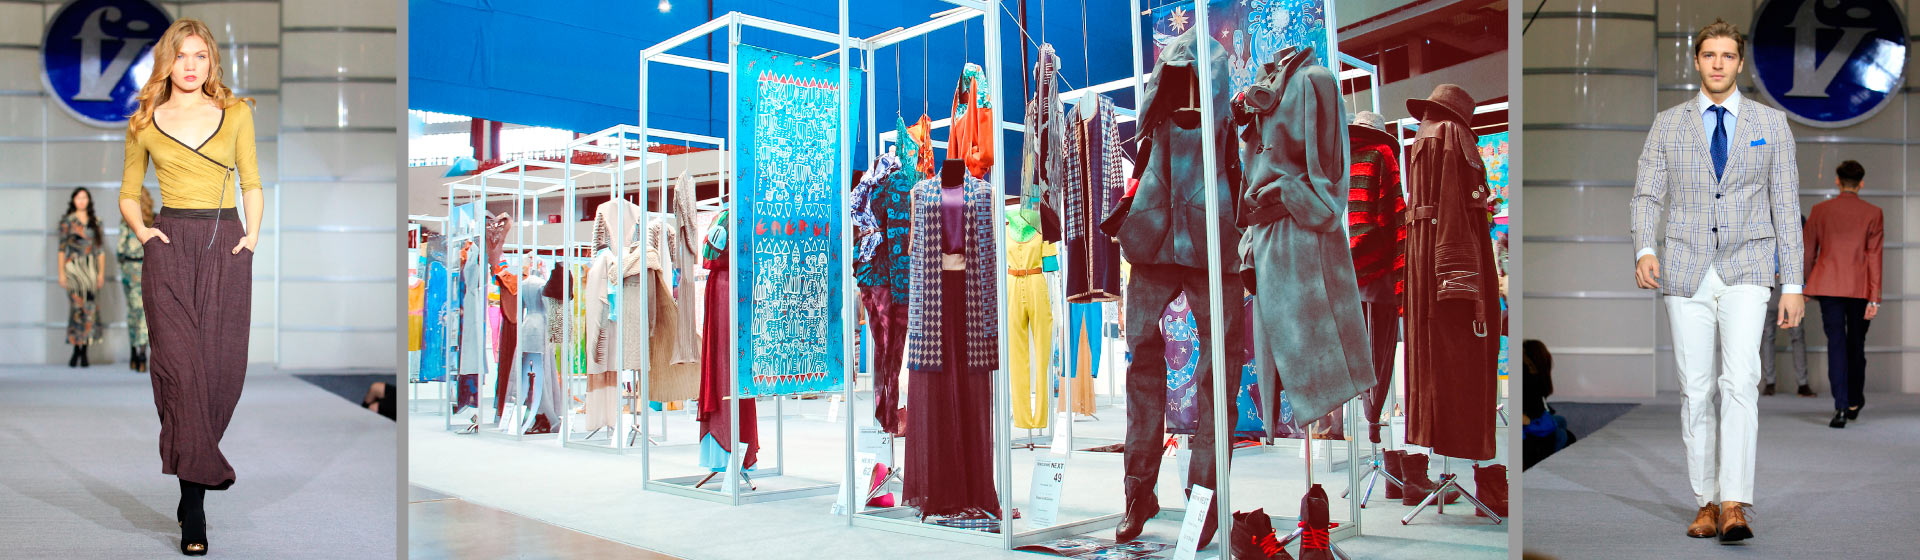 Fashion industry m 31